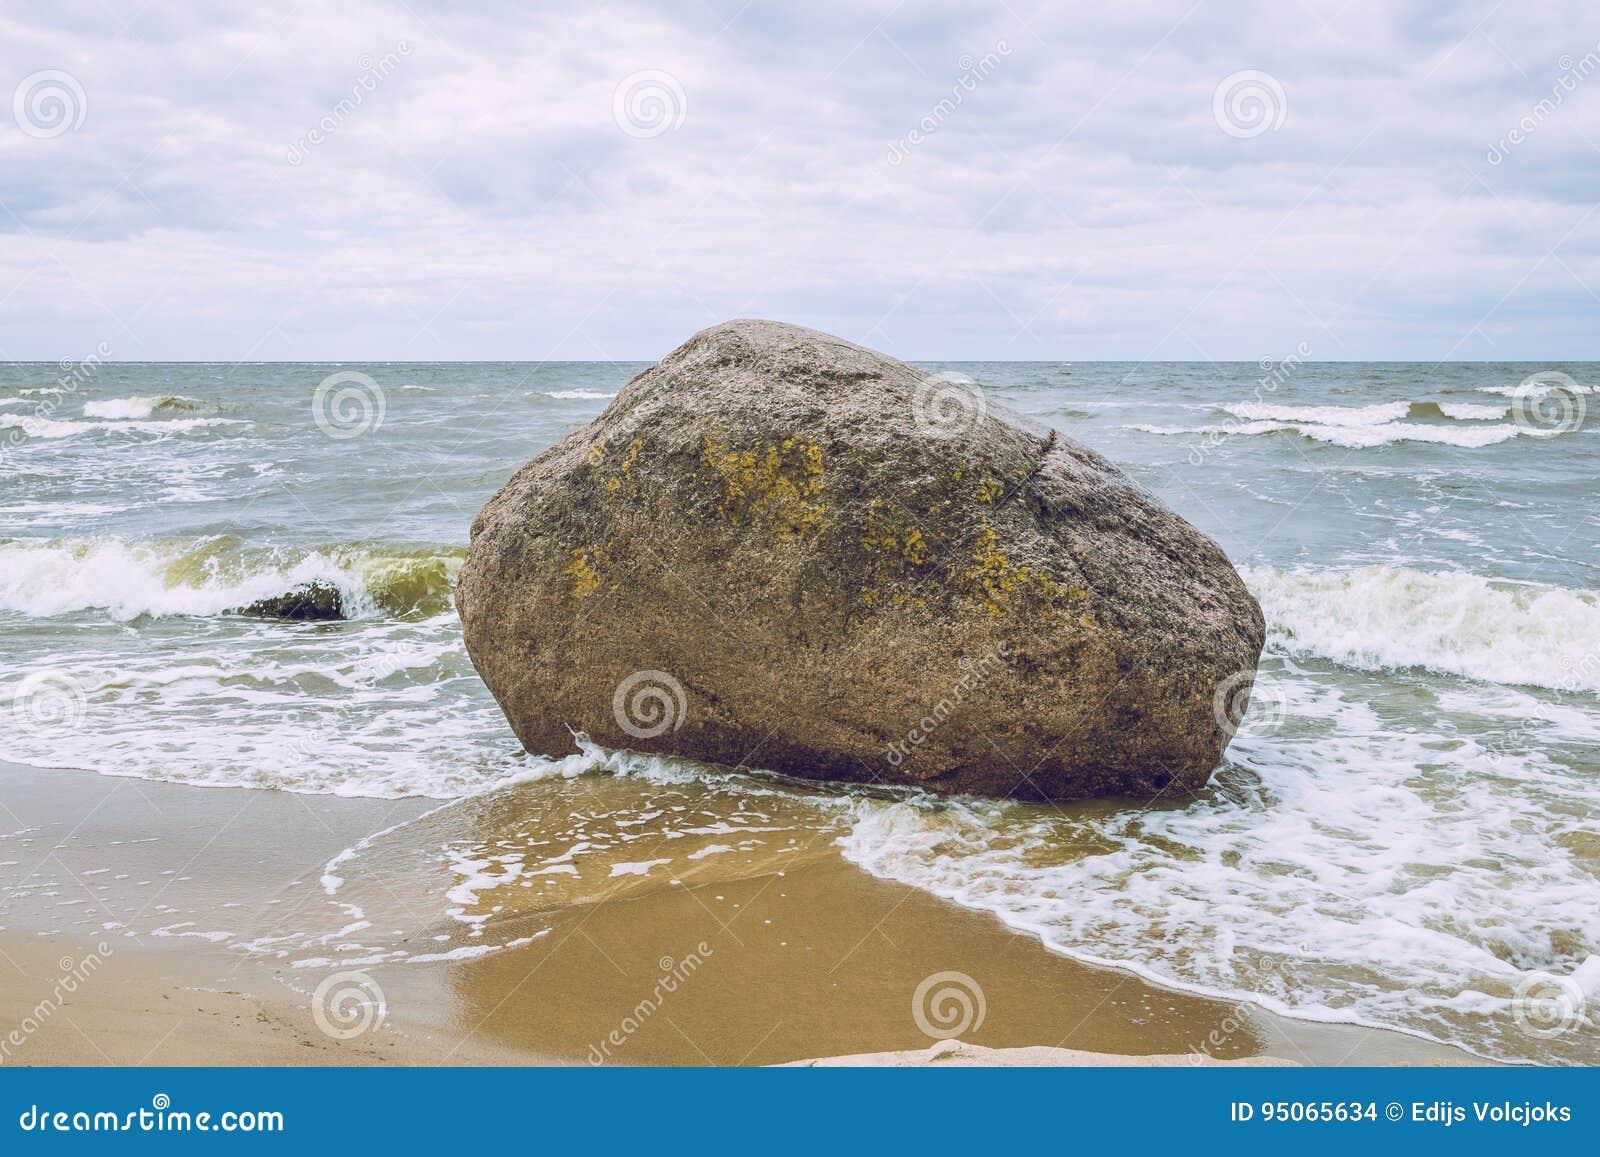 Big rock in Baltic sea, Latvia.